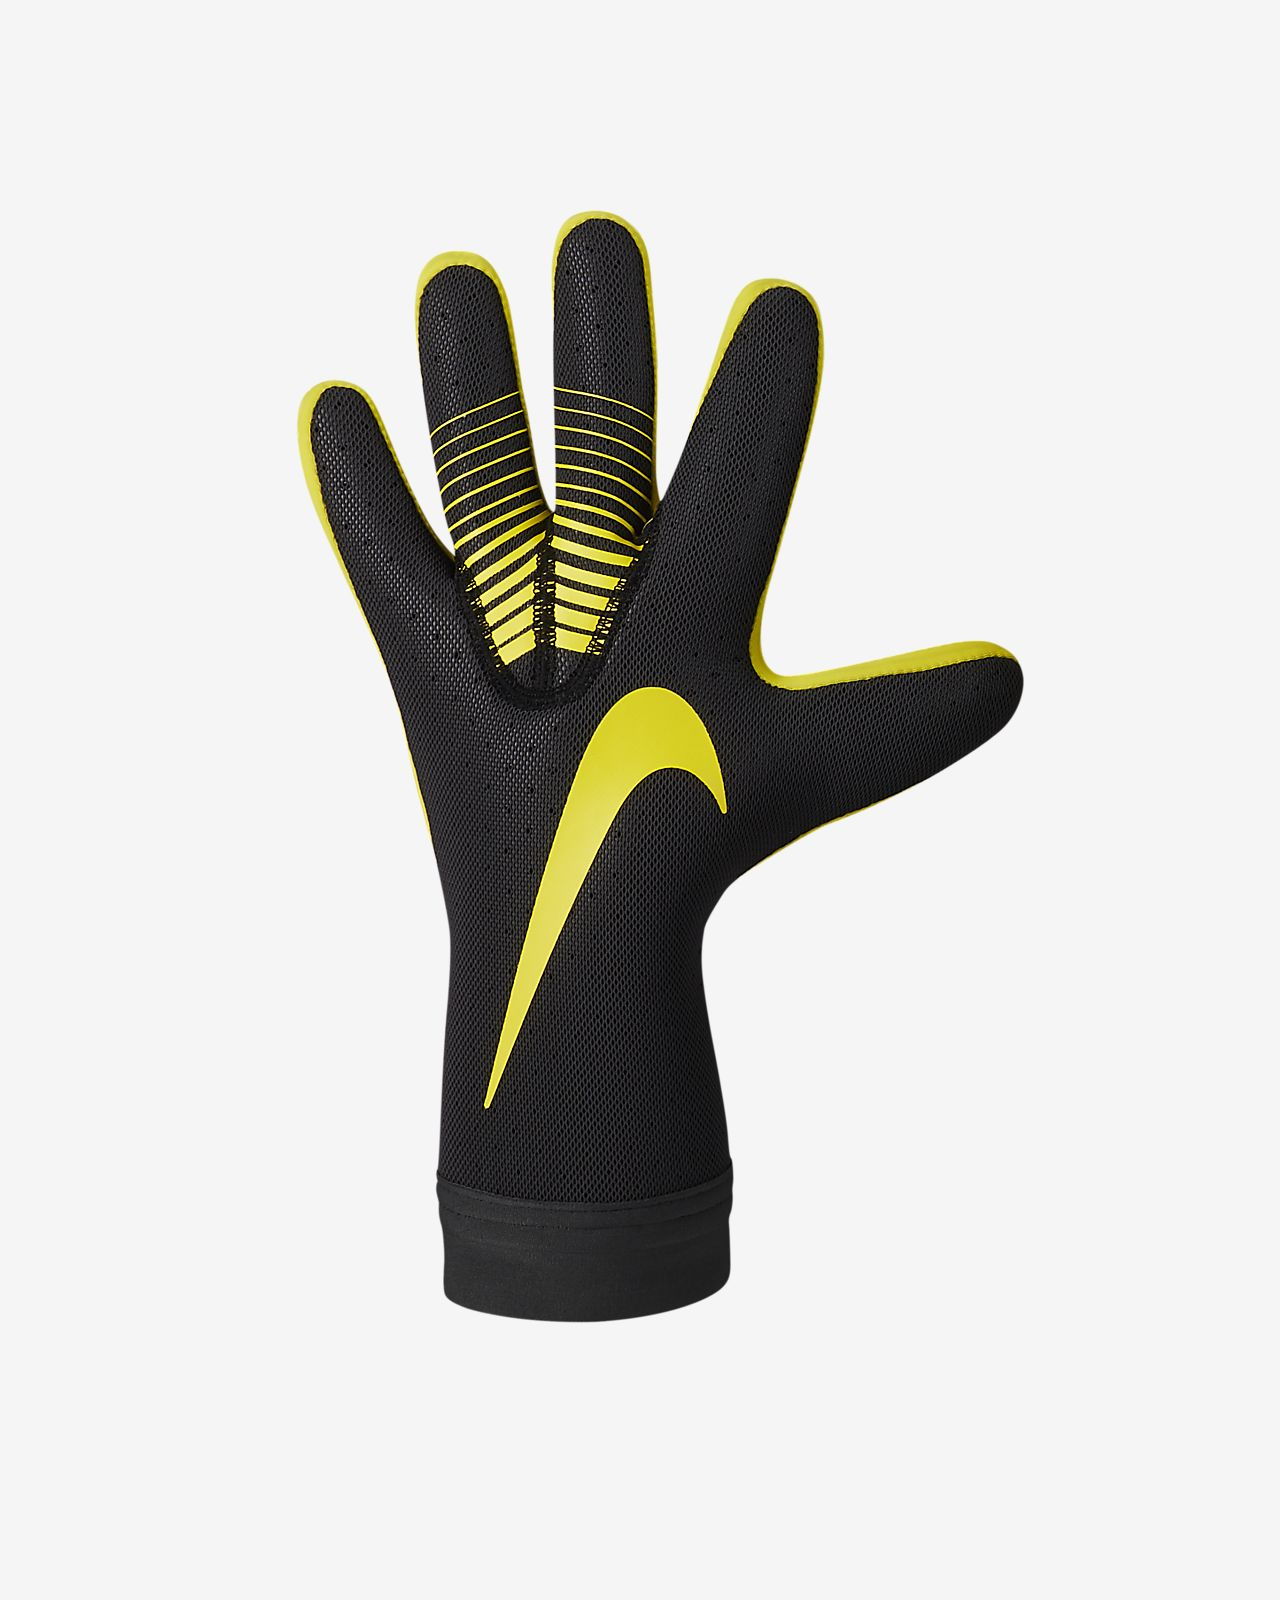 Guanti da calcio Nike Goalkeeper Touch Elite